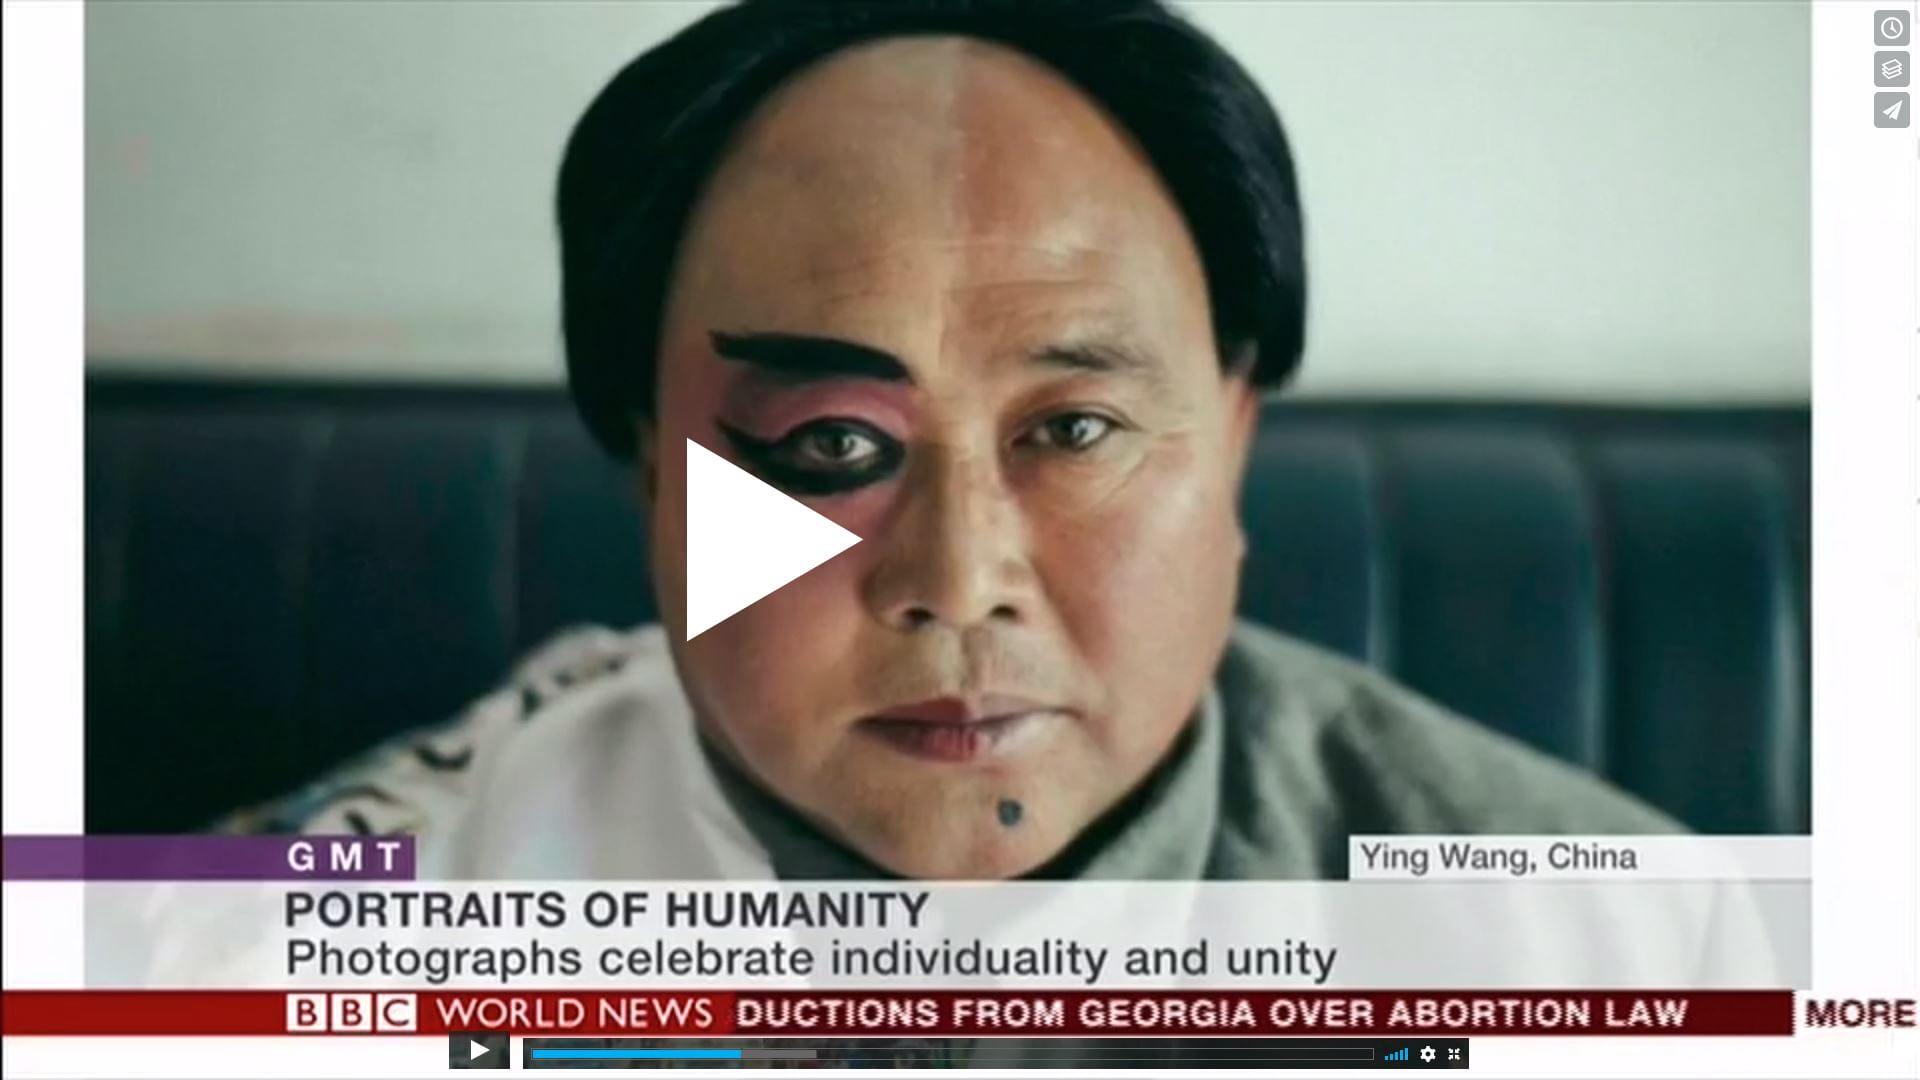 Watch Portrait of Humanity on BBC World News – British